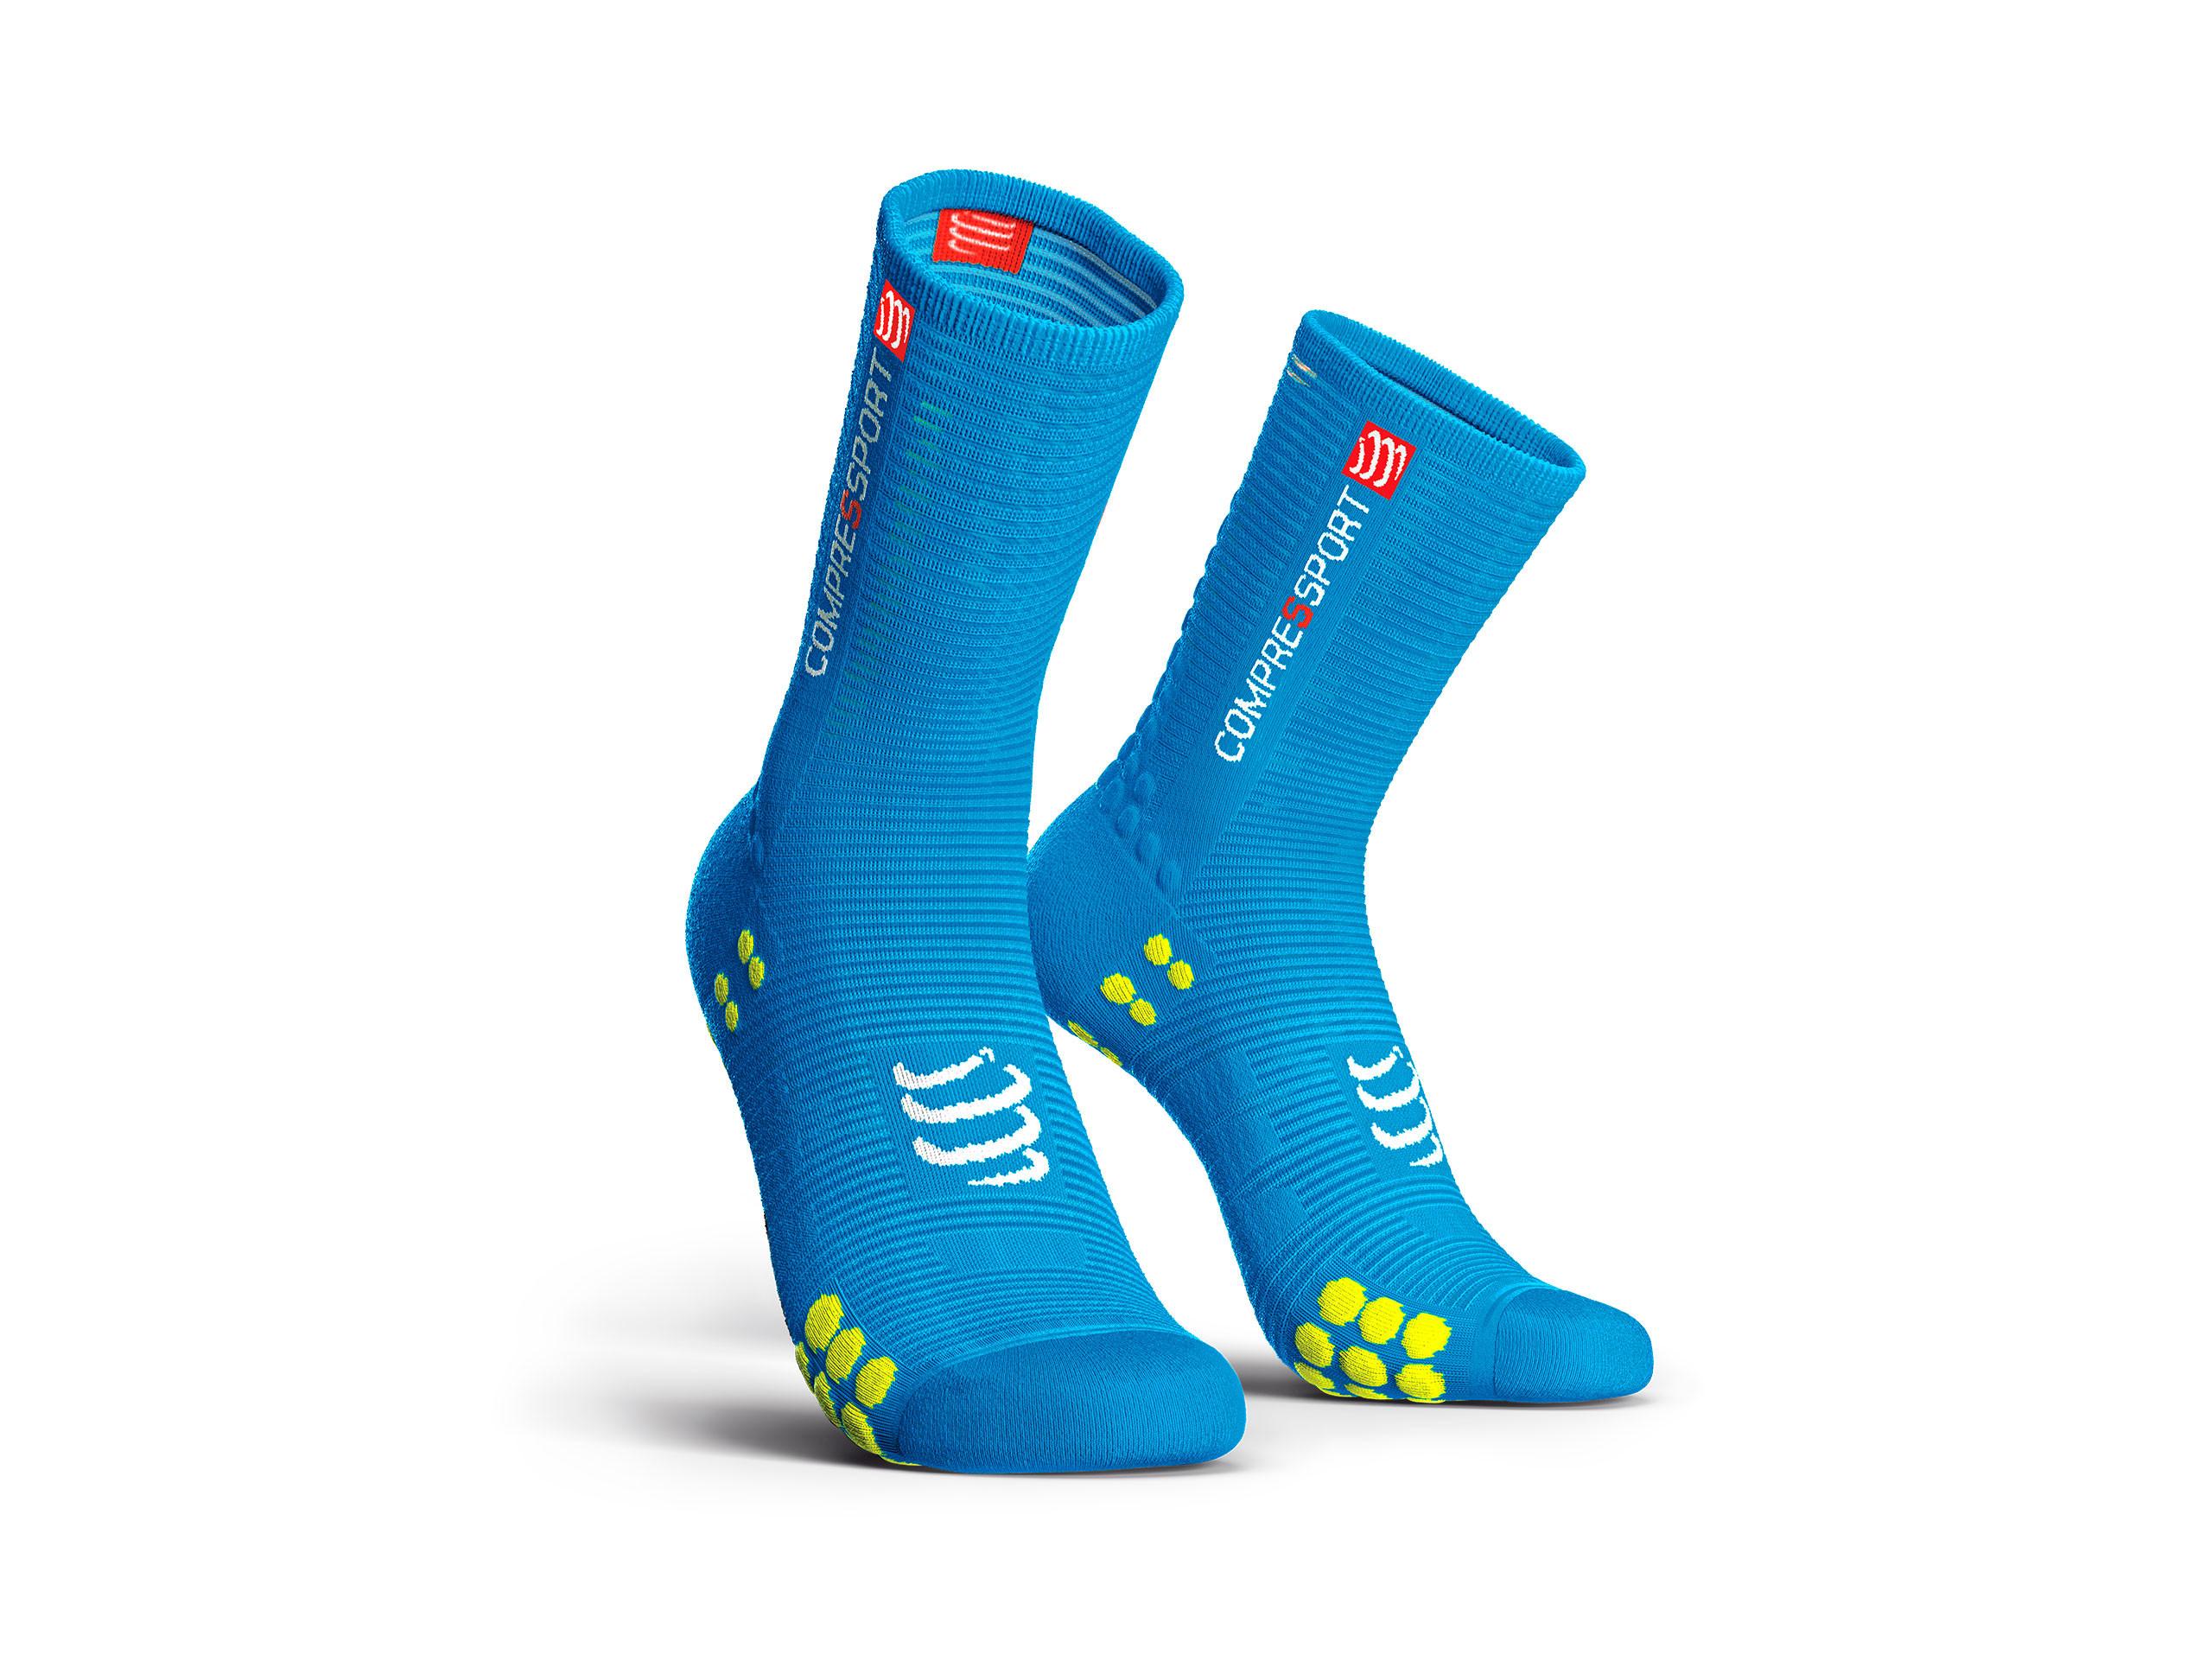 Pro Racing Socks v3.0 Bike iceblue